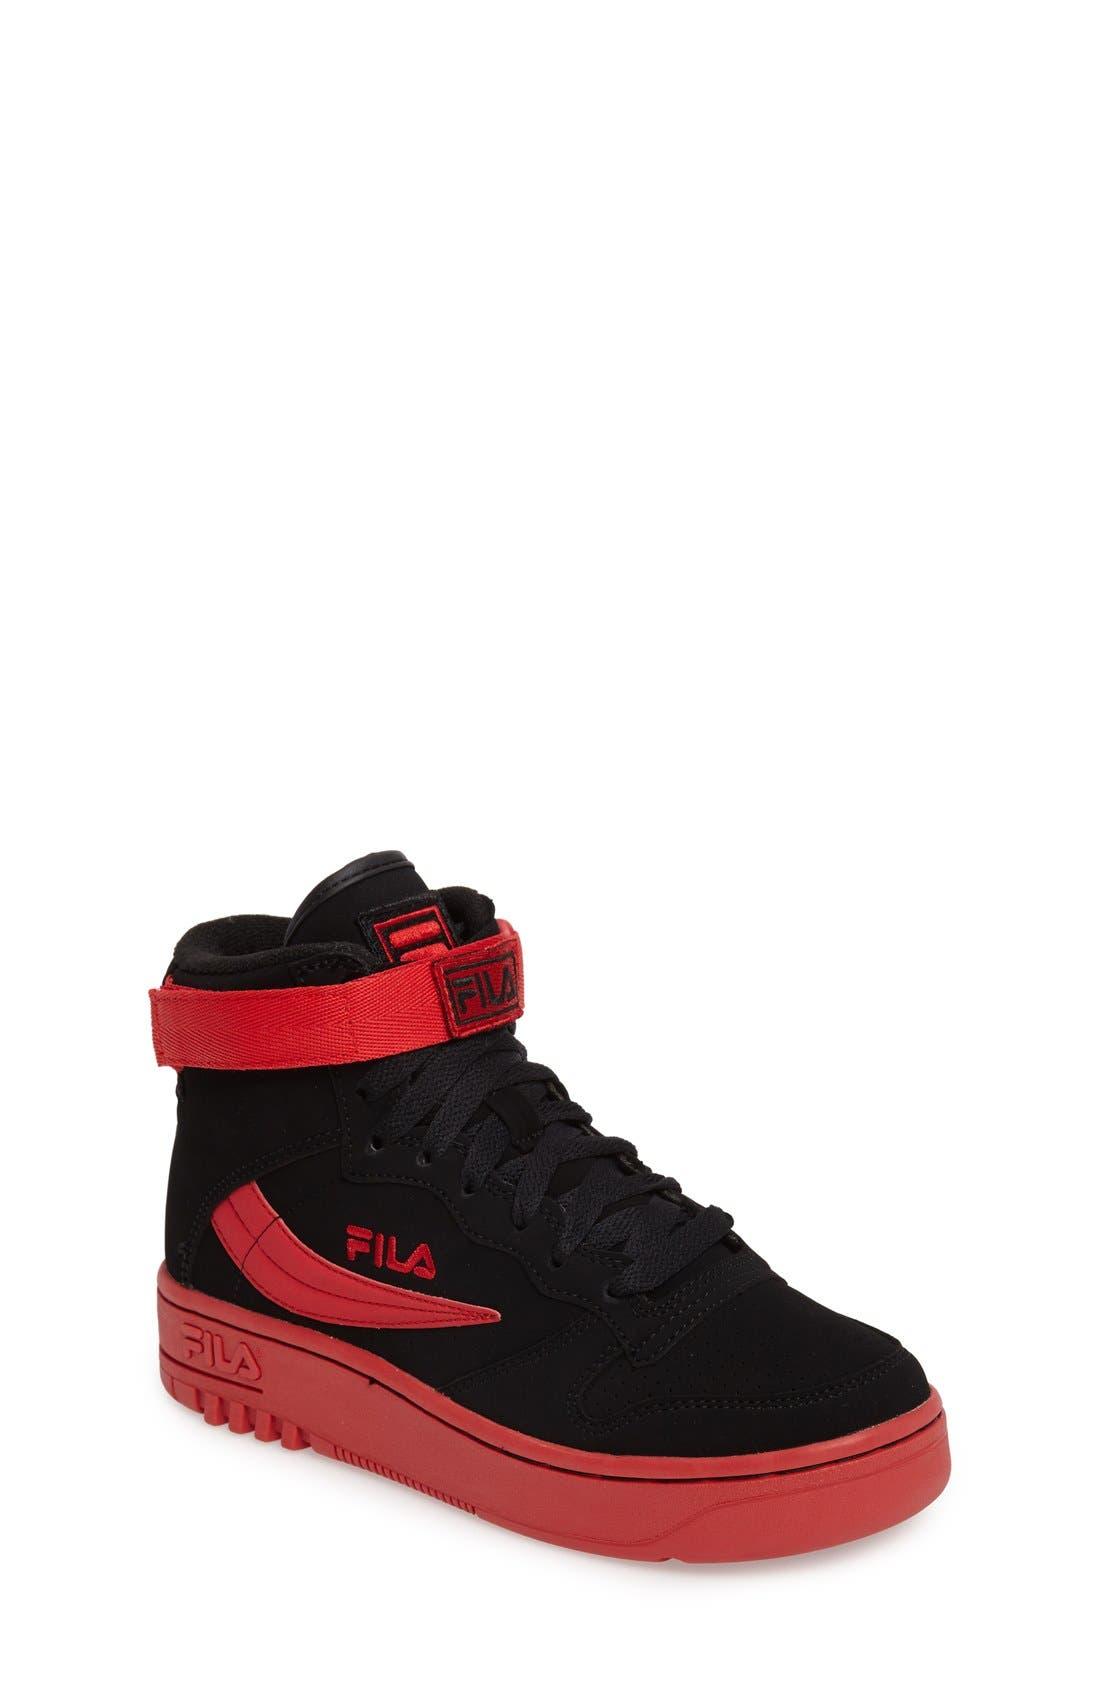 Fila USA FX-100 High Top Sneaker (Big Kid)